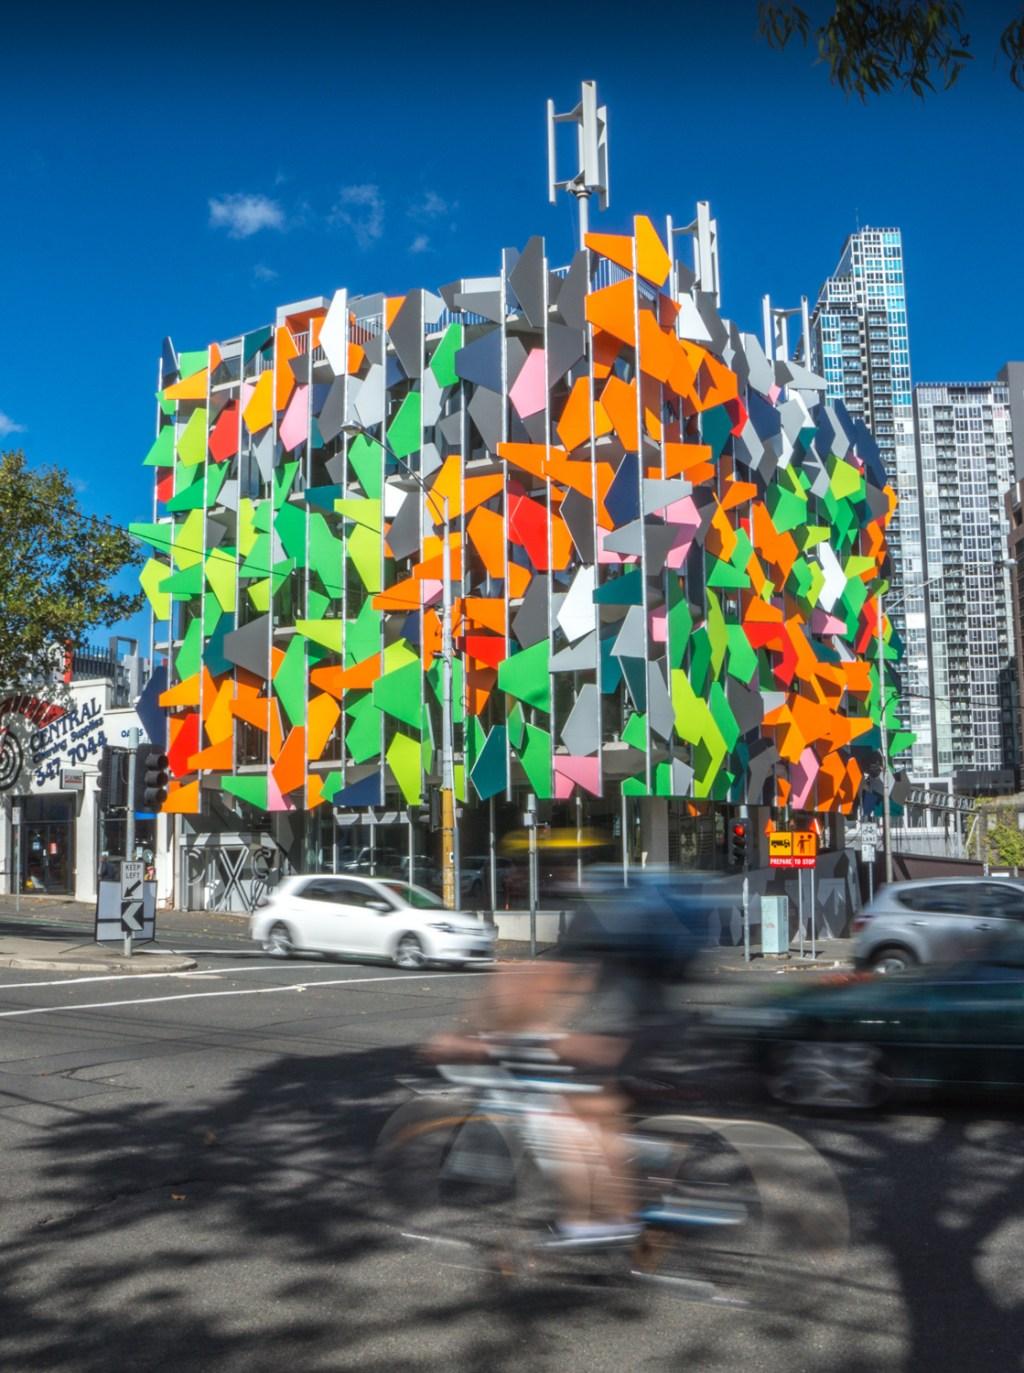 Pixel Building / Studio 505 / Melbourne